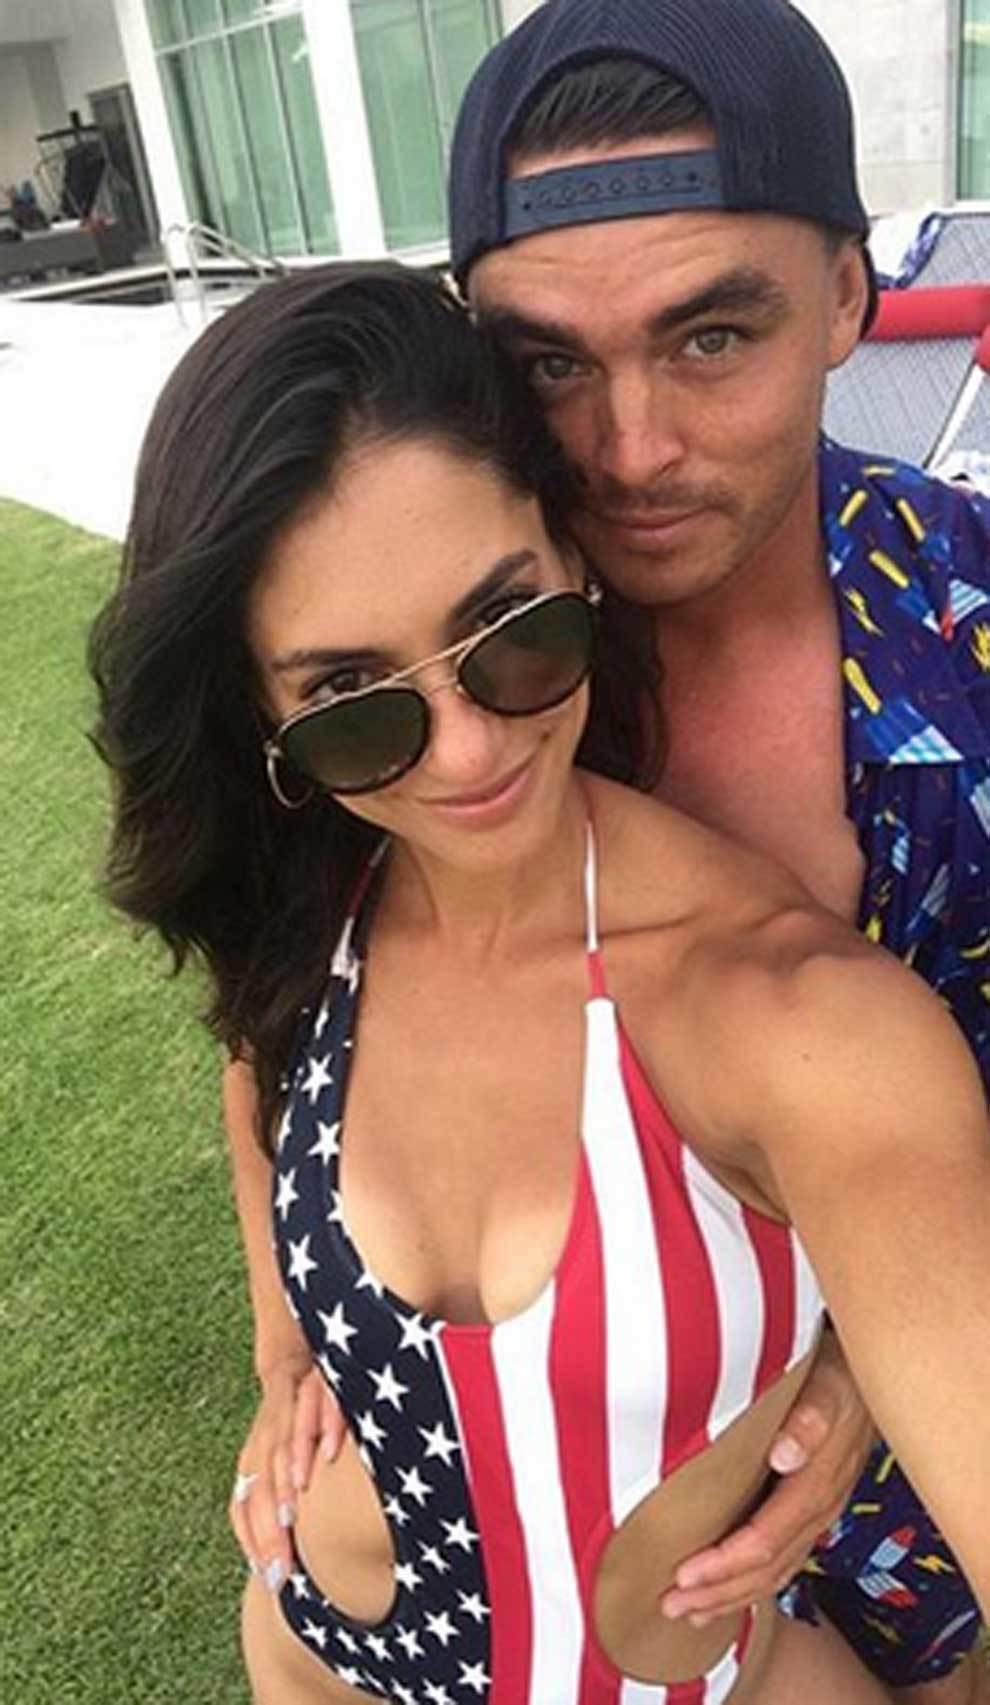 El golfista Rickie Fowler y su prometida Allison Stokke